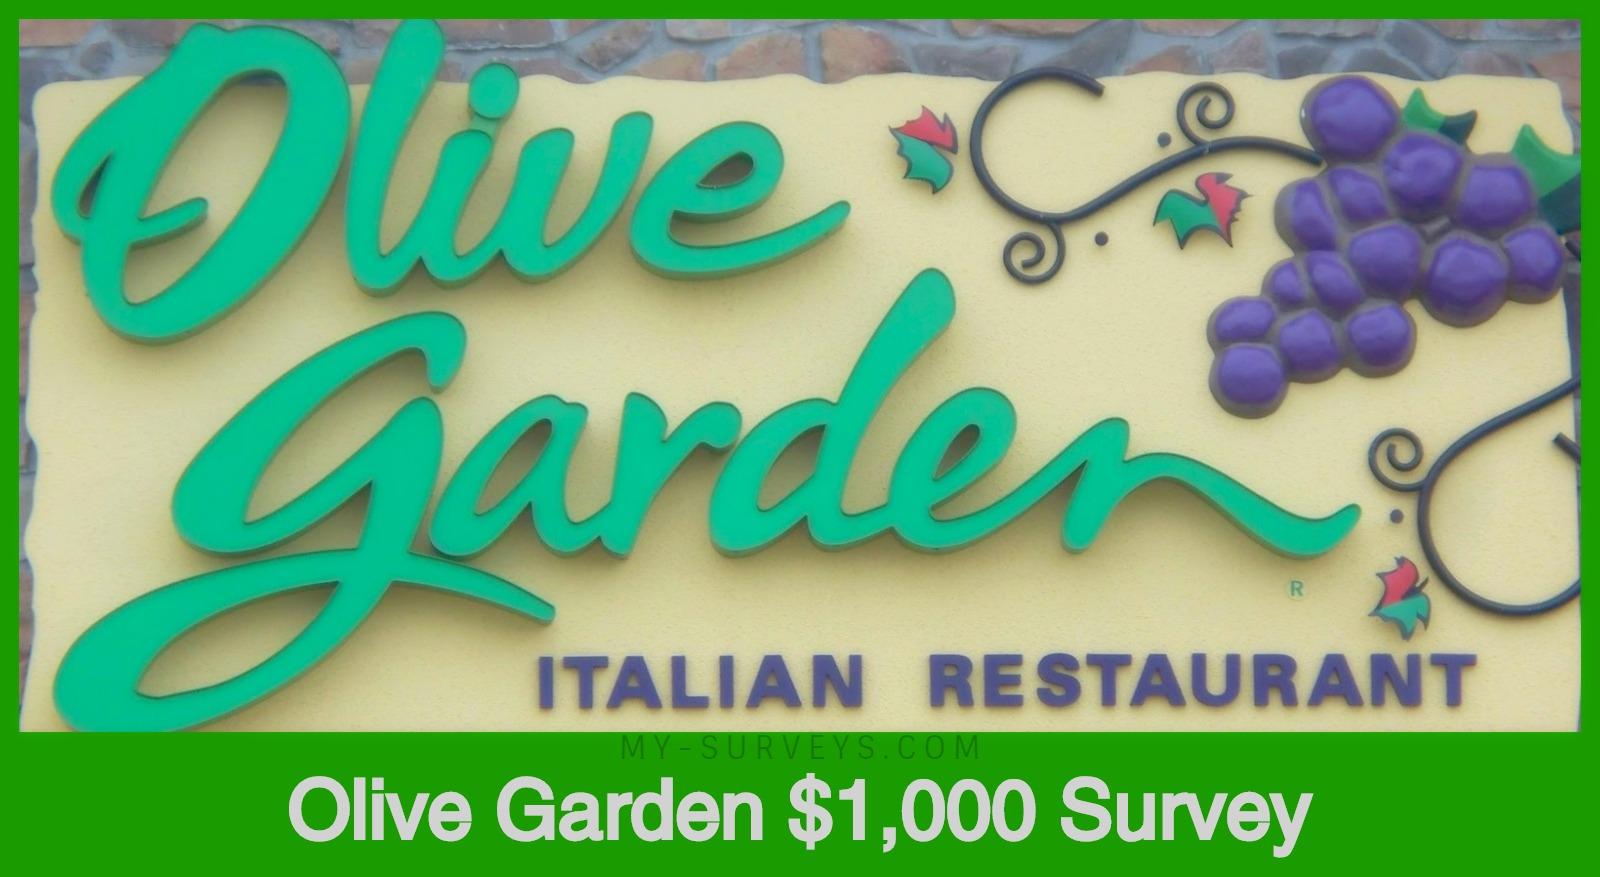 Olive Garden Survey Sweepstakes